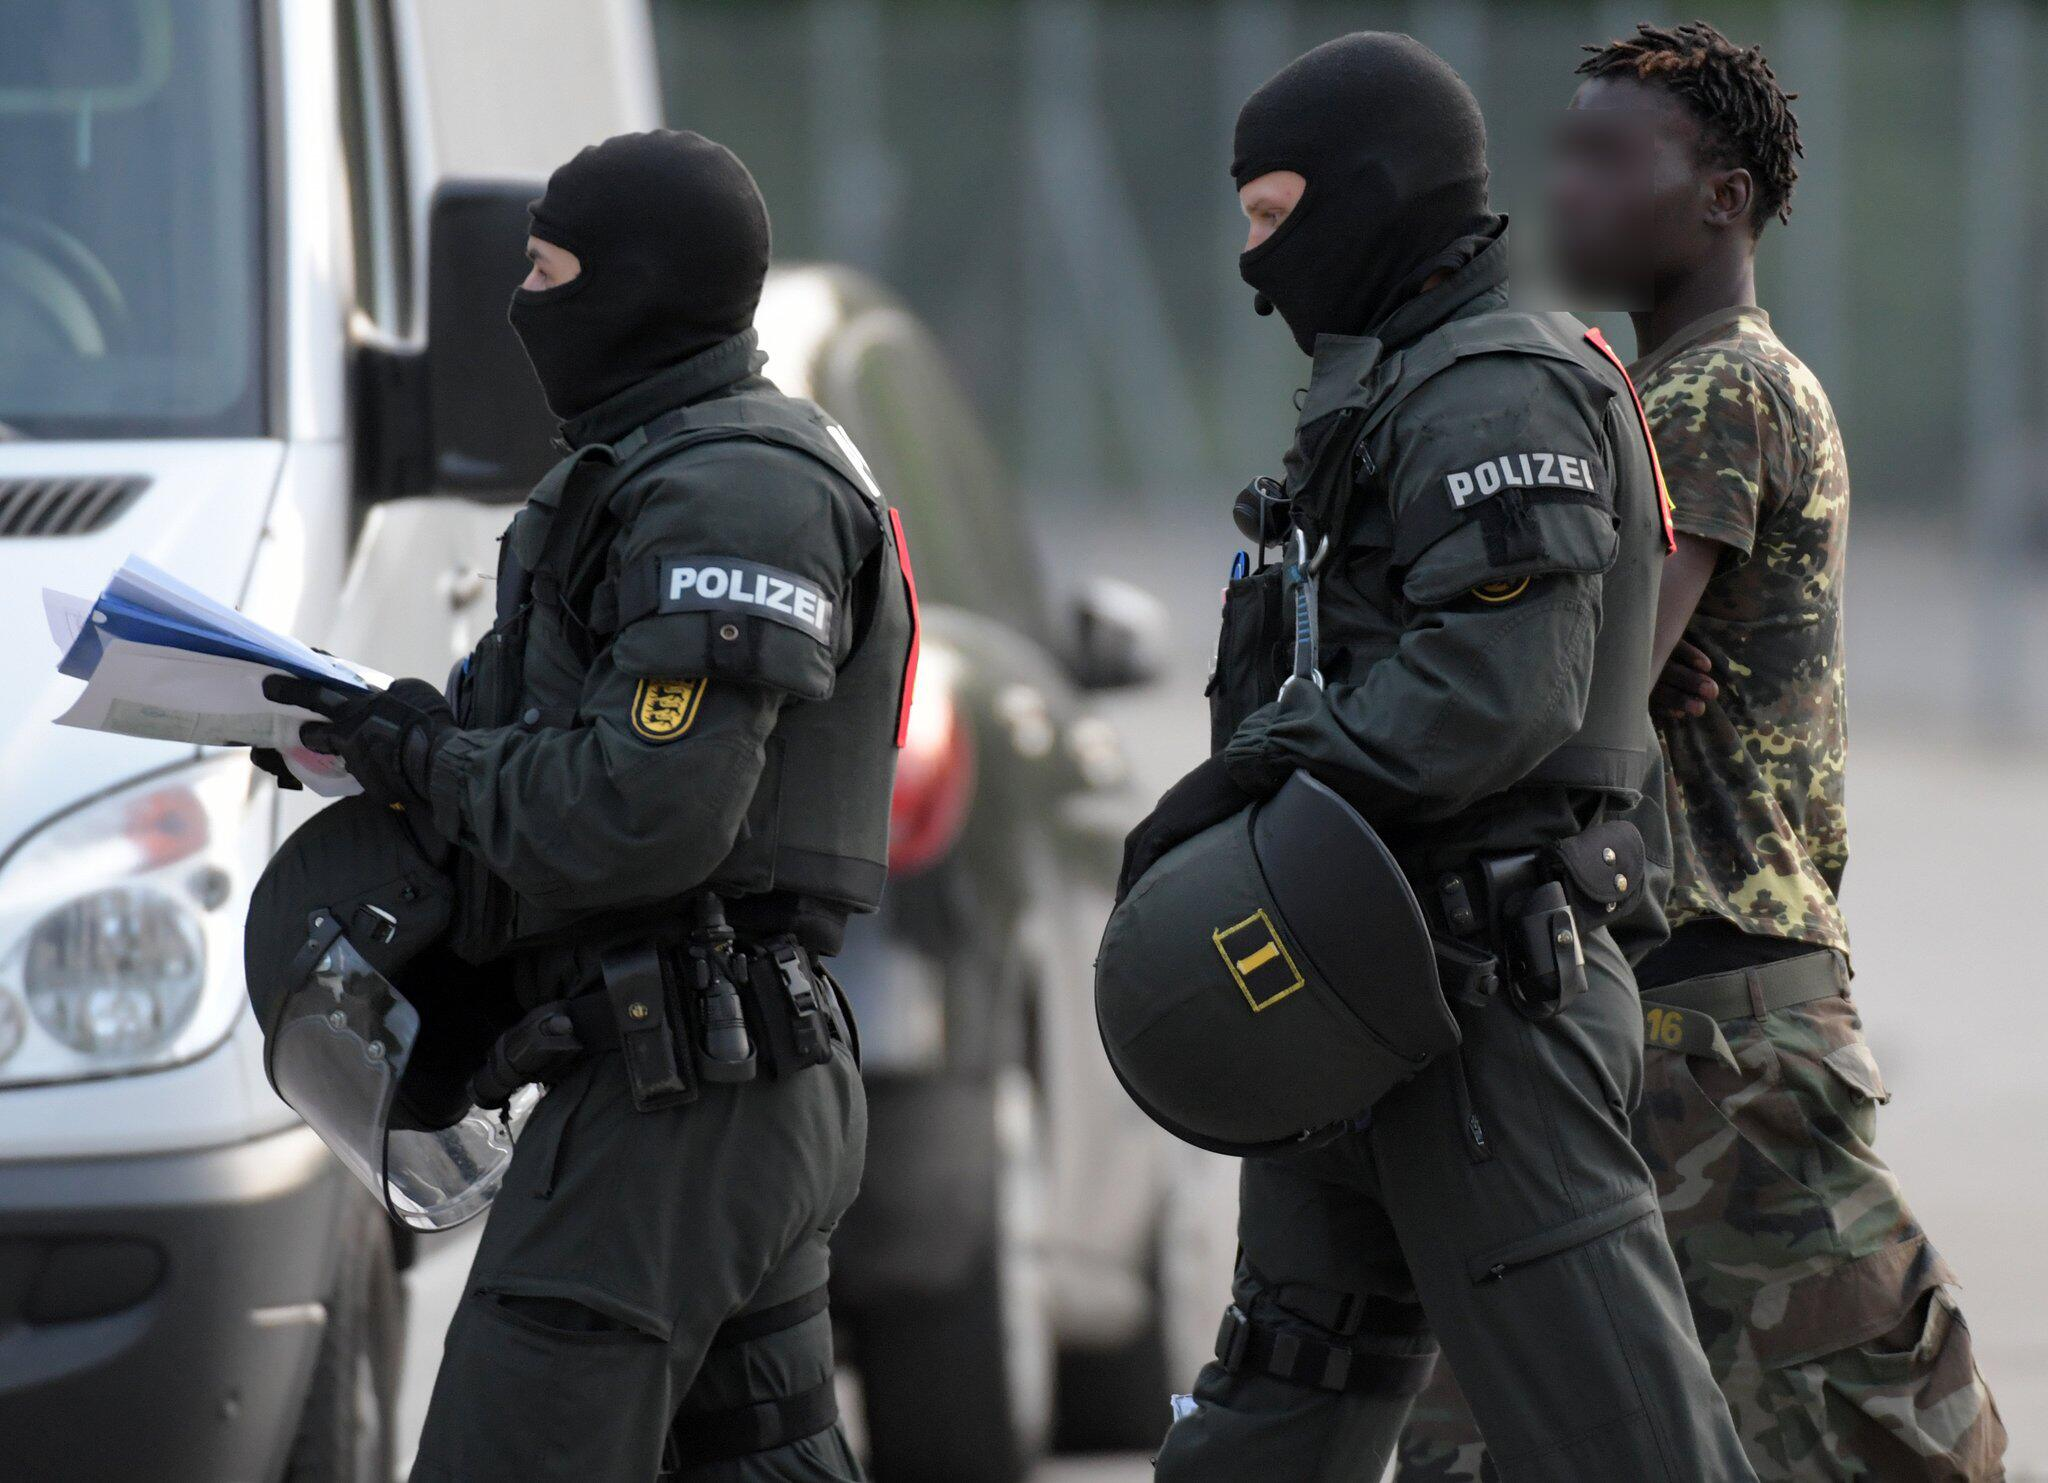 Bild zu Police operation at refugee centre in Germany